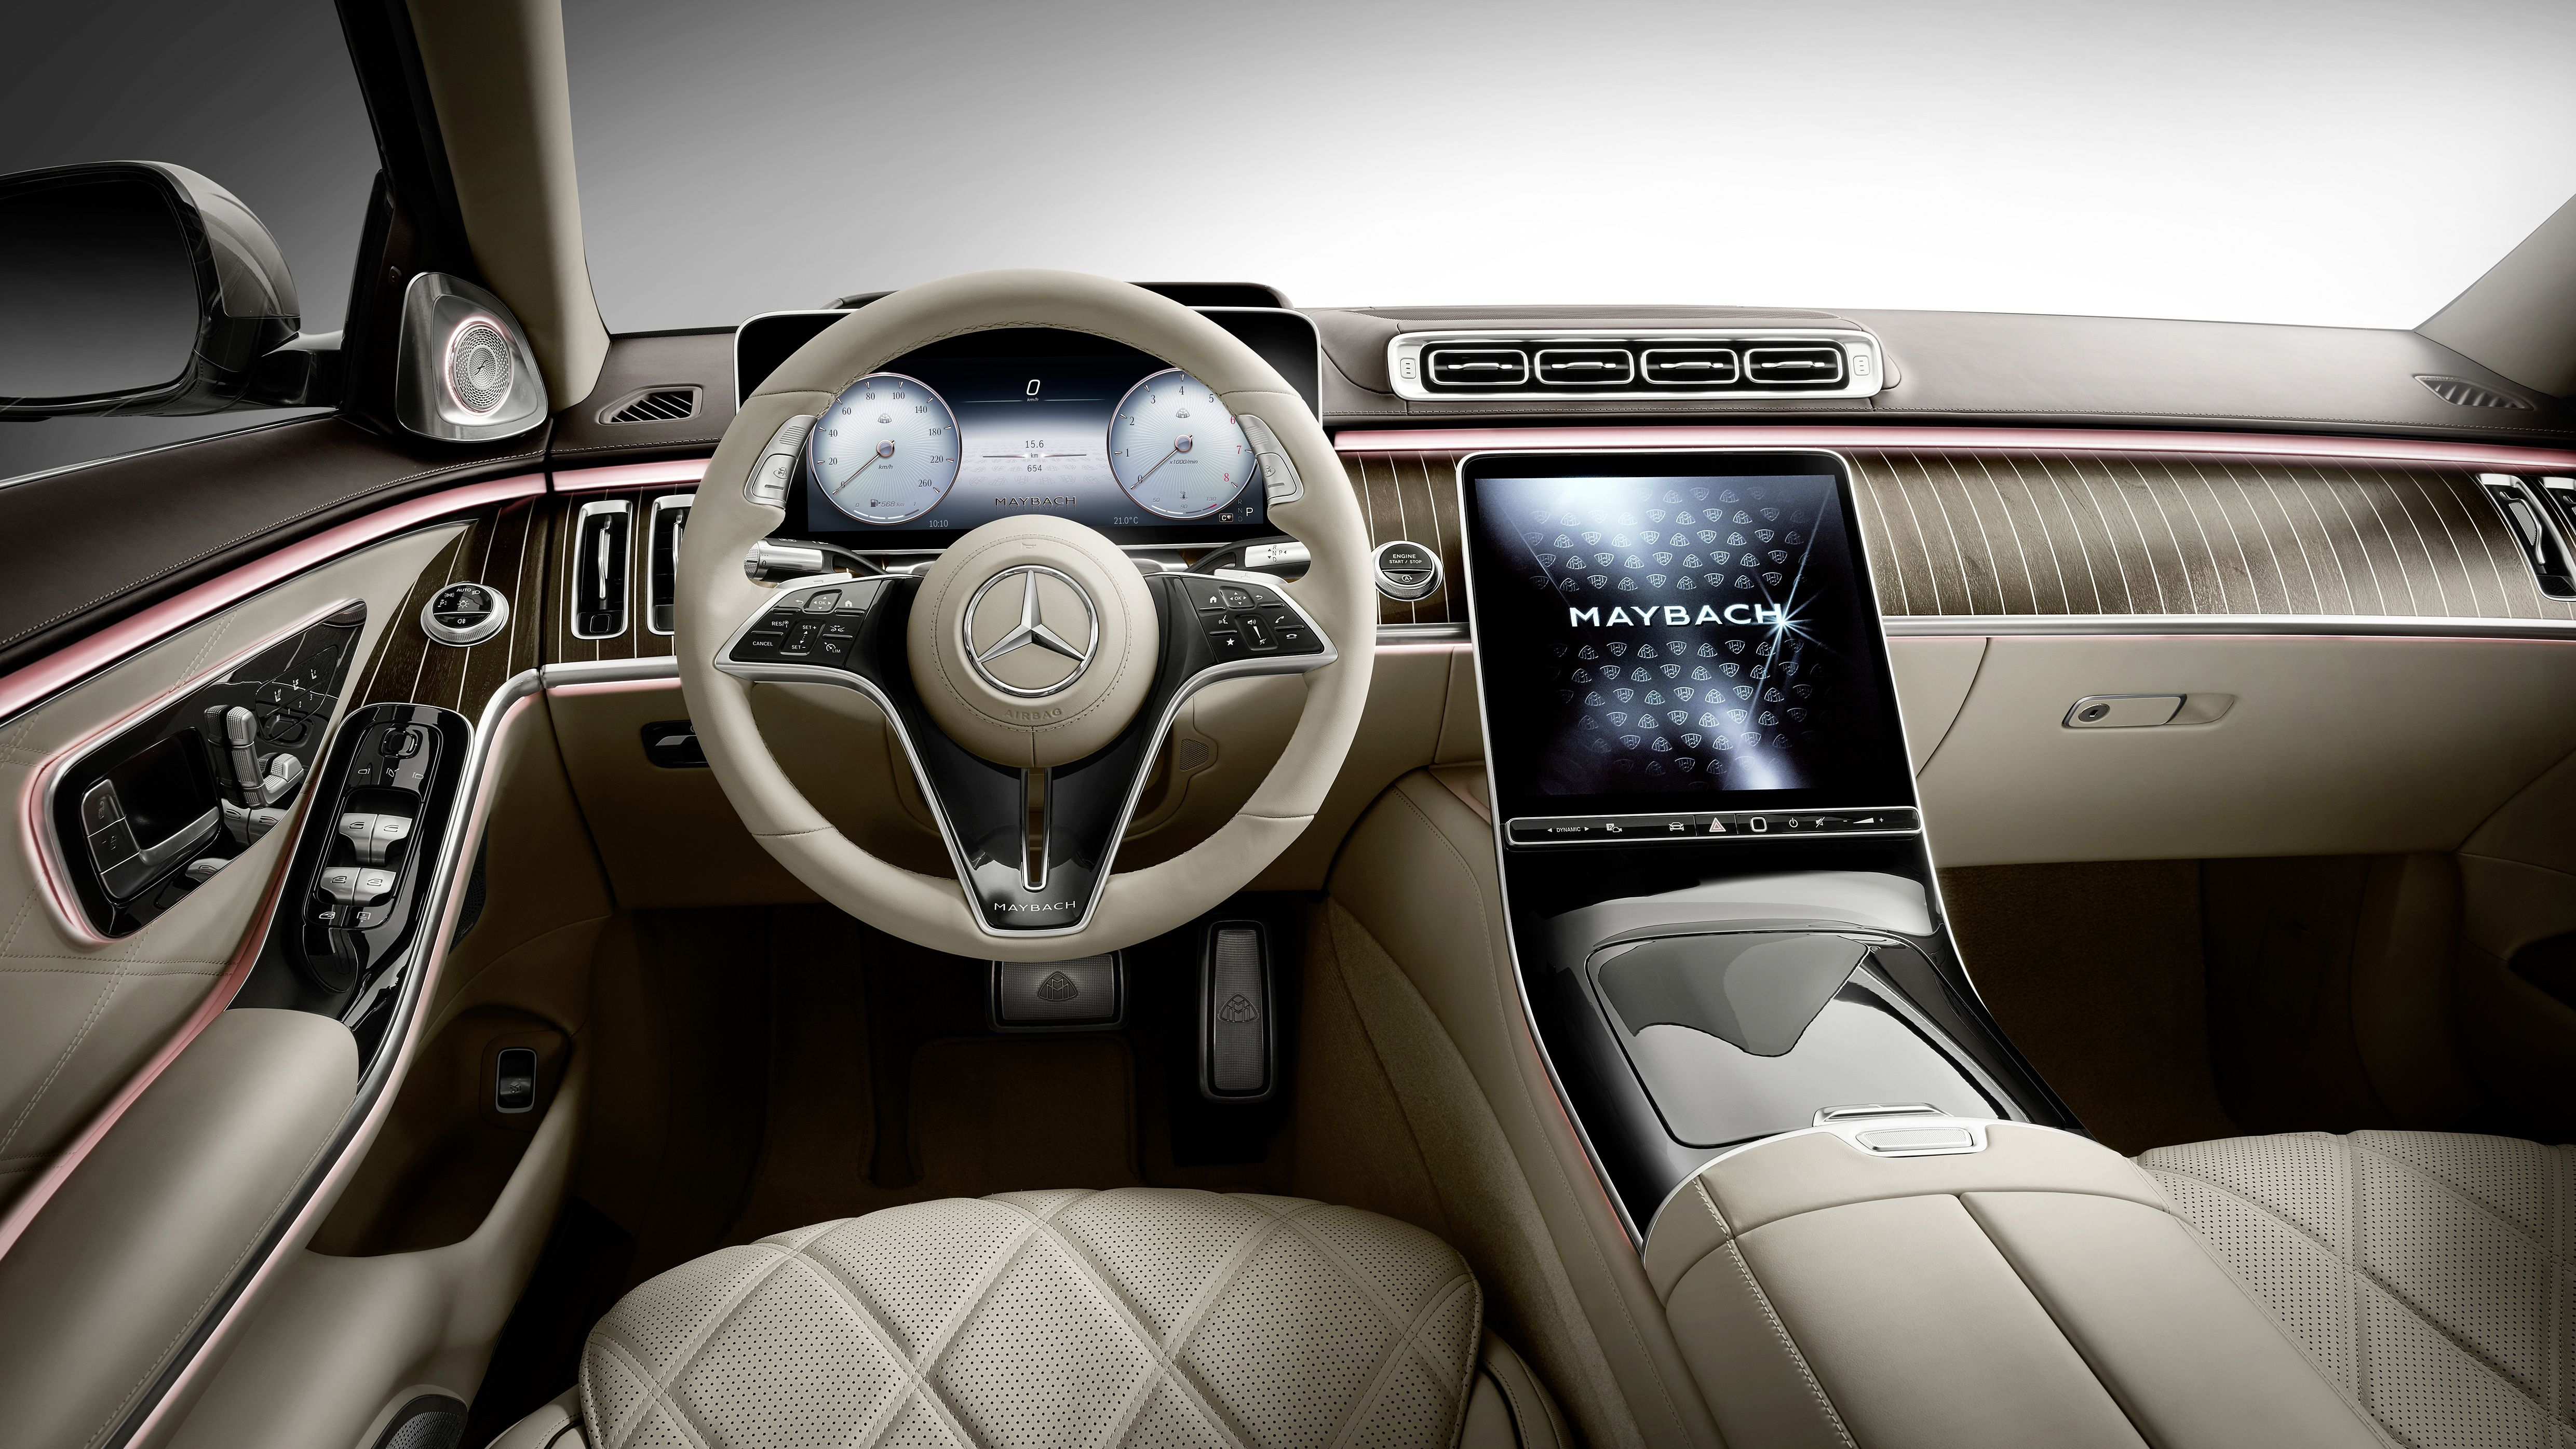 Mercedes S Class Maybach Interior 4k Mercedes S Class Maybach 4961x2791